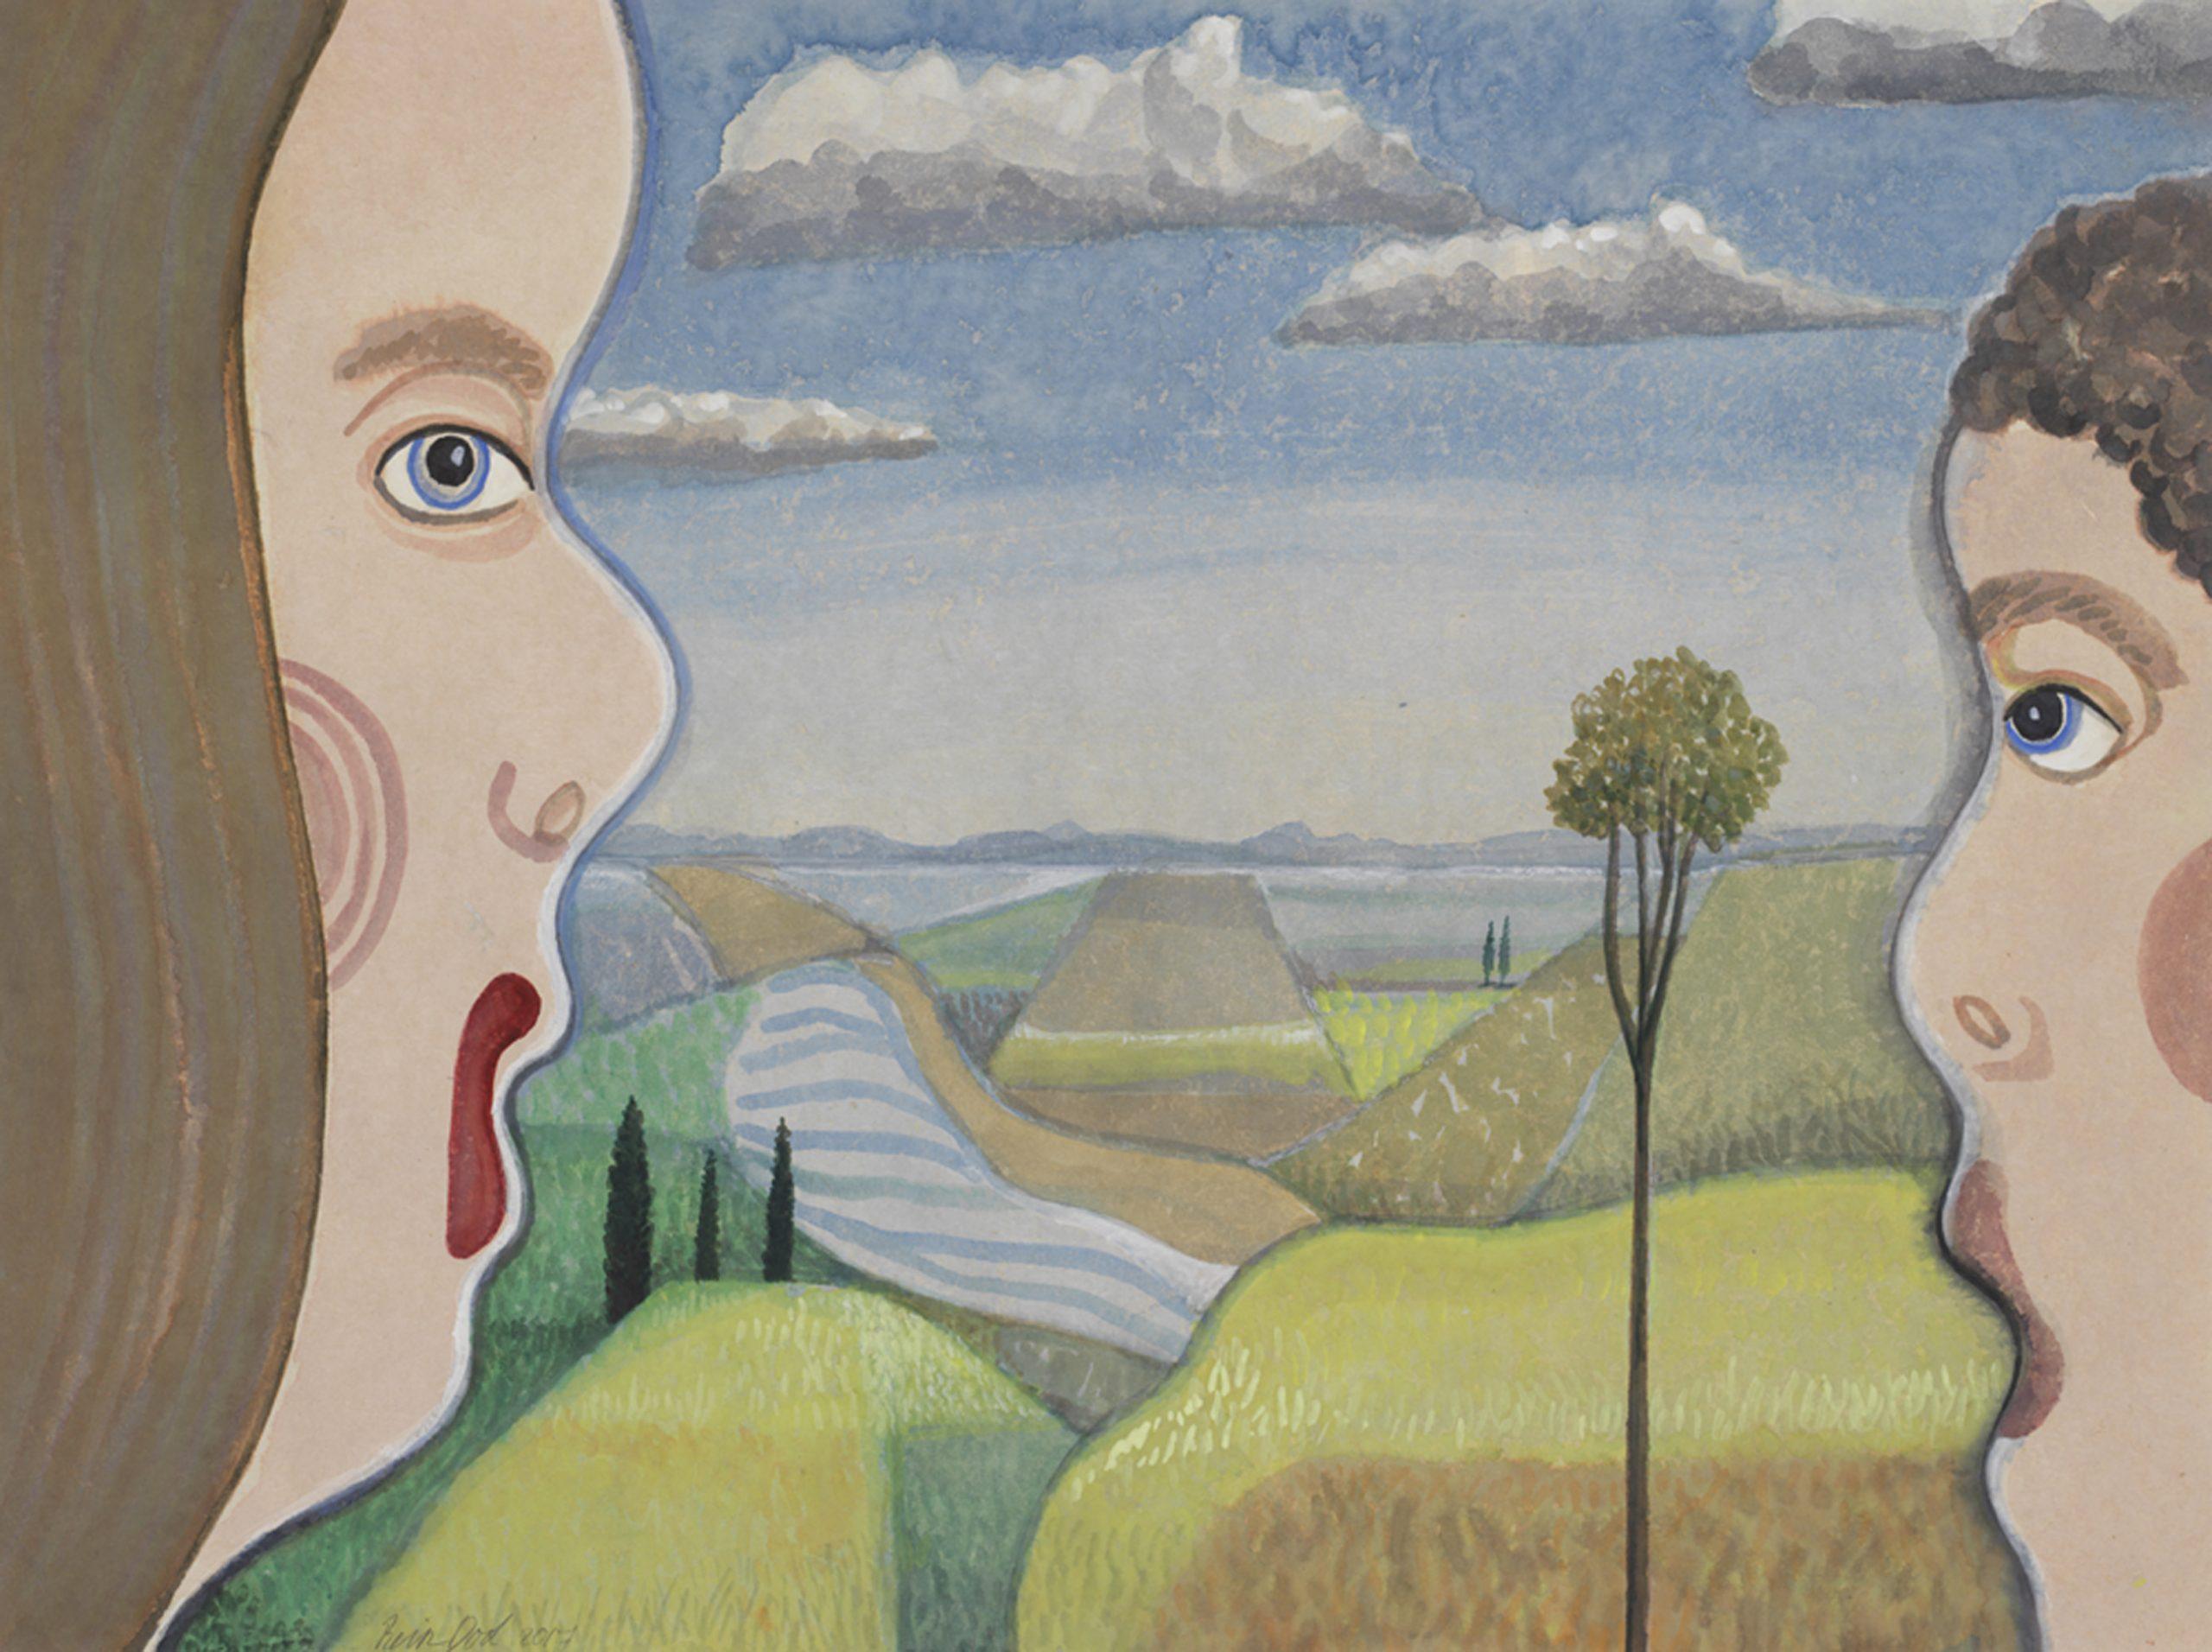 Landschap - Rein Dool, 60x80 cm. aquarel 2017